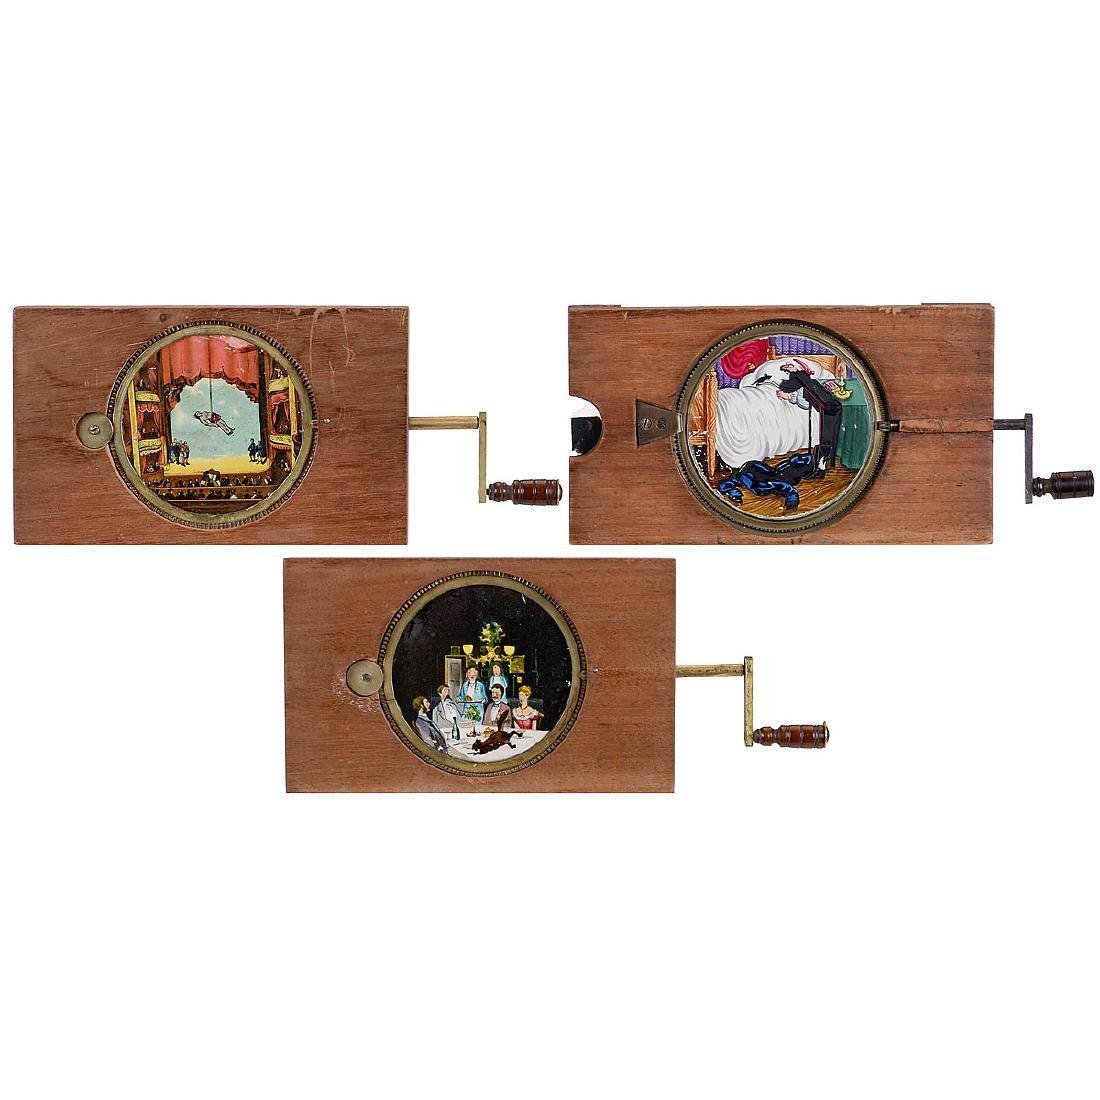 3 Magic Lantern Single Lever Slides, 1880-1900